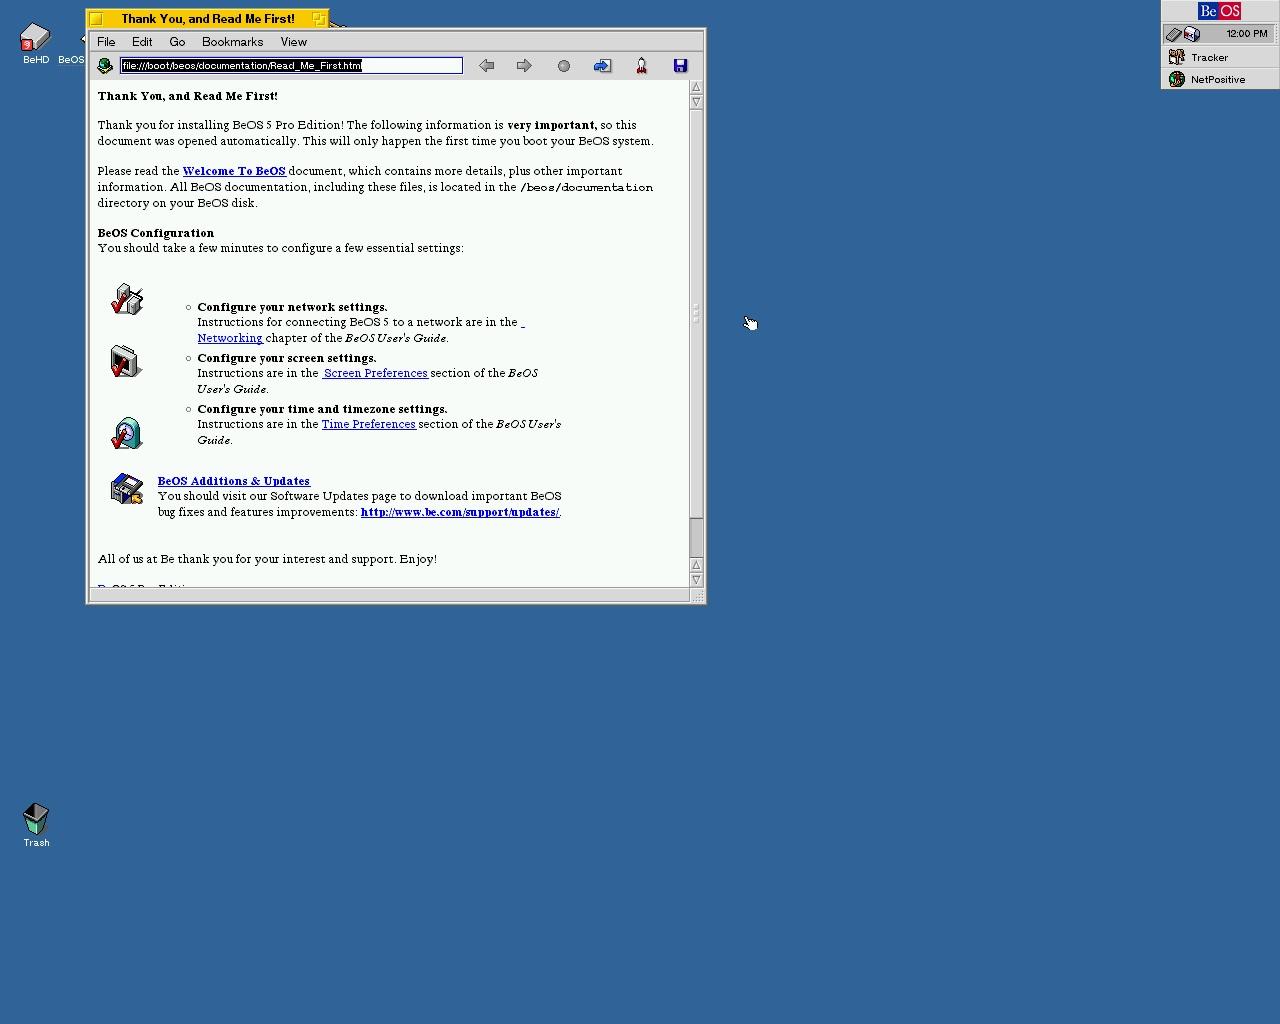 hacks_VirtualBox_BeOS_06_08_2019_12_00_05.jpg